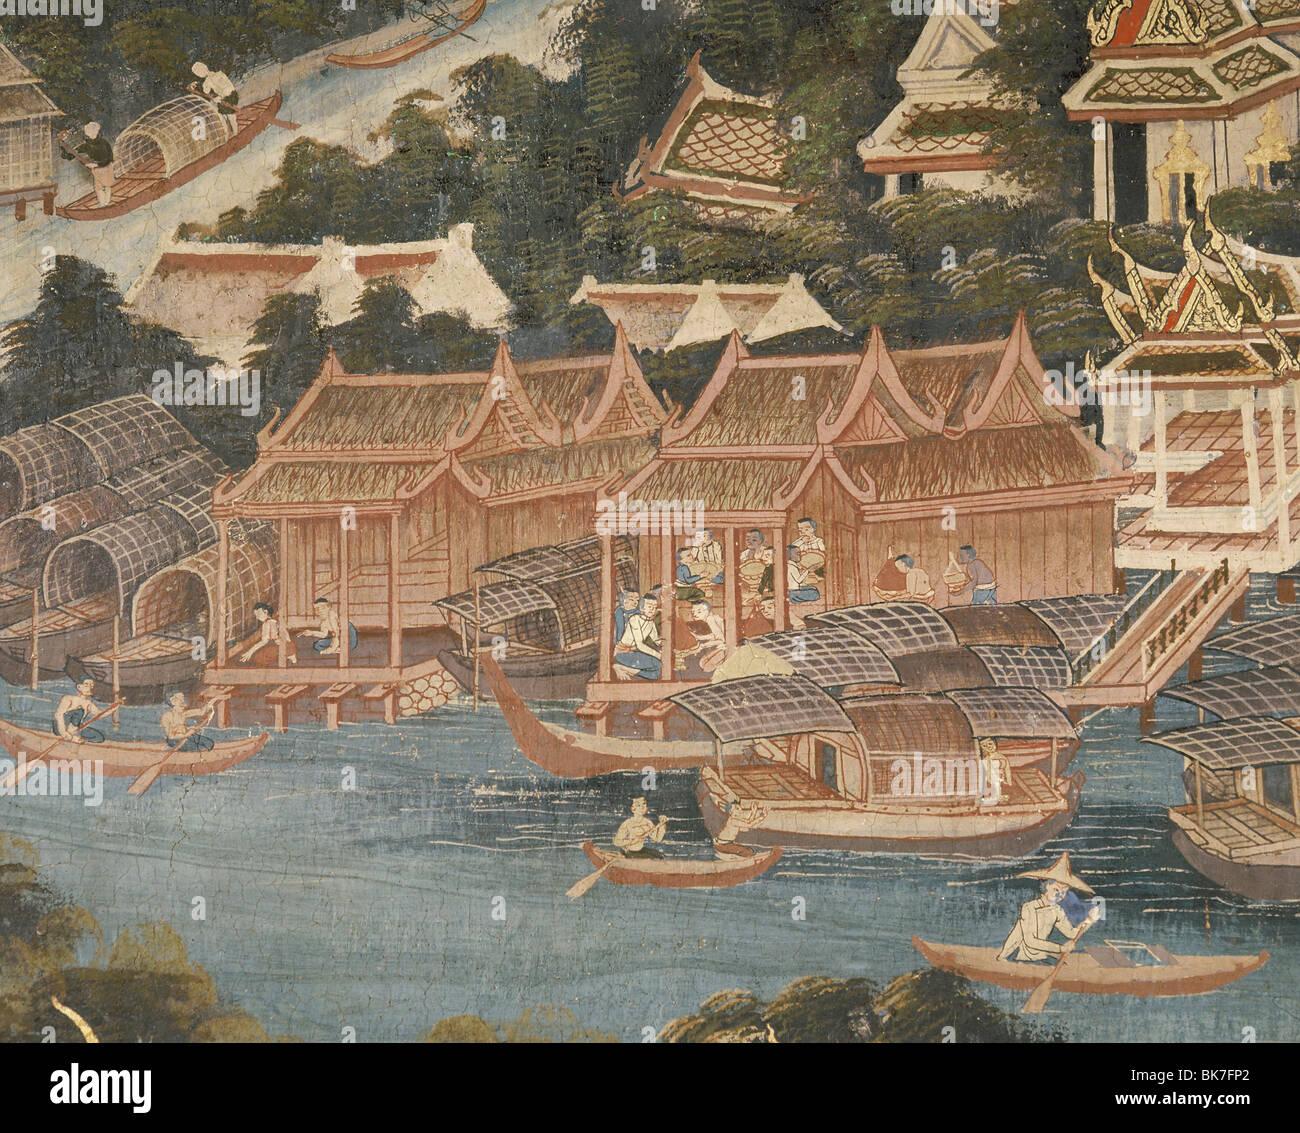 Detail of a mural showing houses along the Chaophraya River, Wat Rajapradit, Bangkok, Thailand, Southeast Asia, - Stock Image